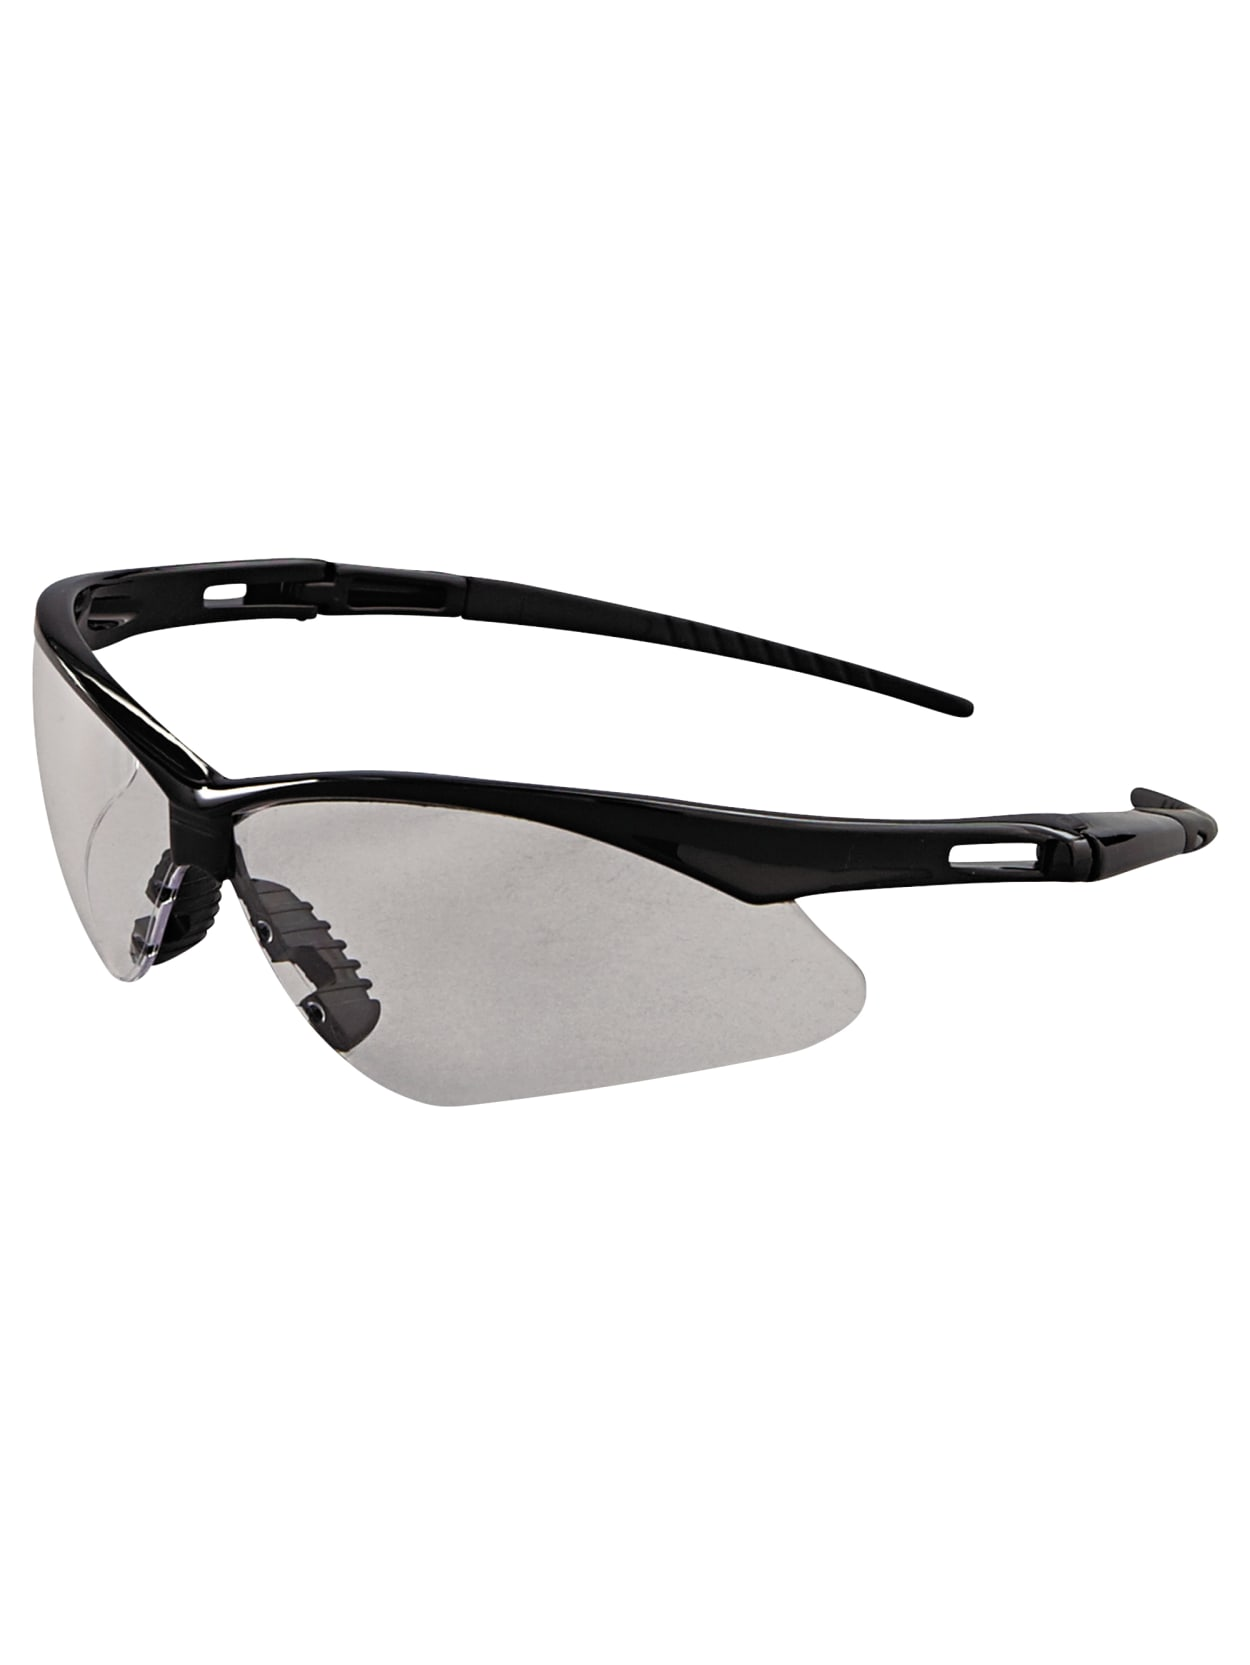 6 Pack Kleenguard Nemesis Safety Eyewear Clear Lens Black Frame